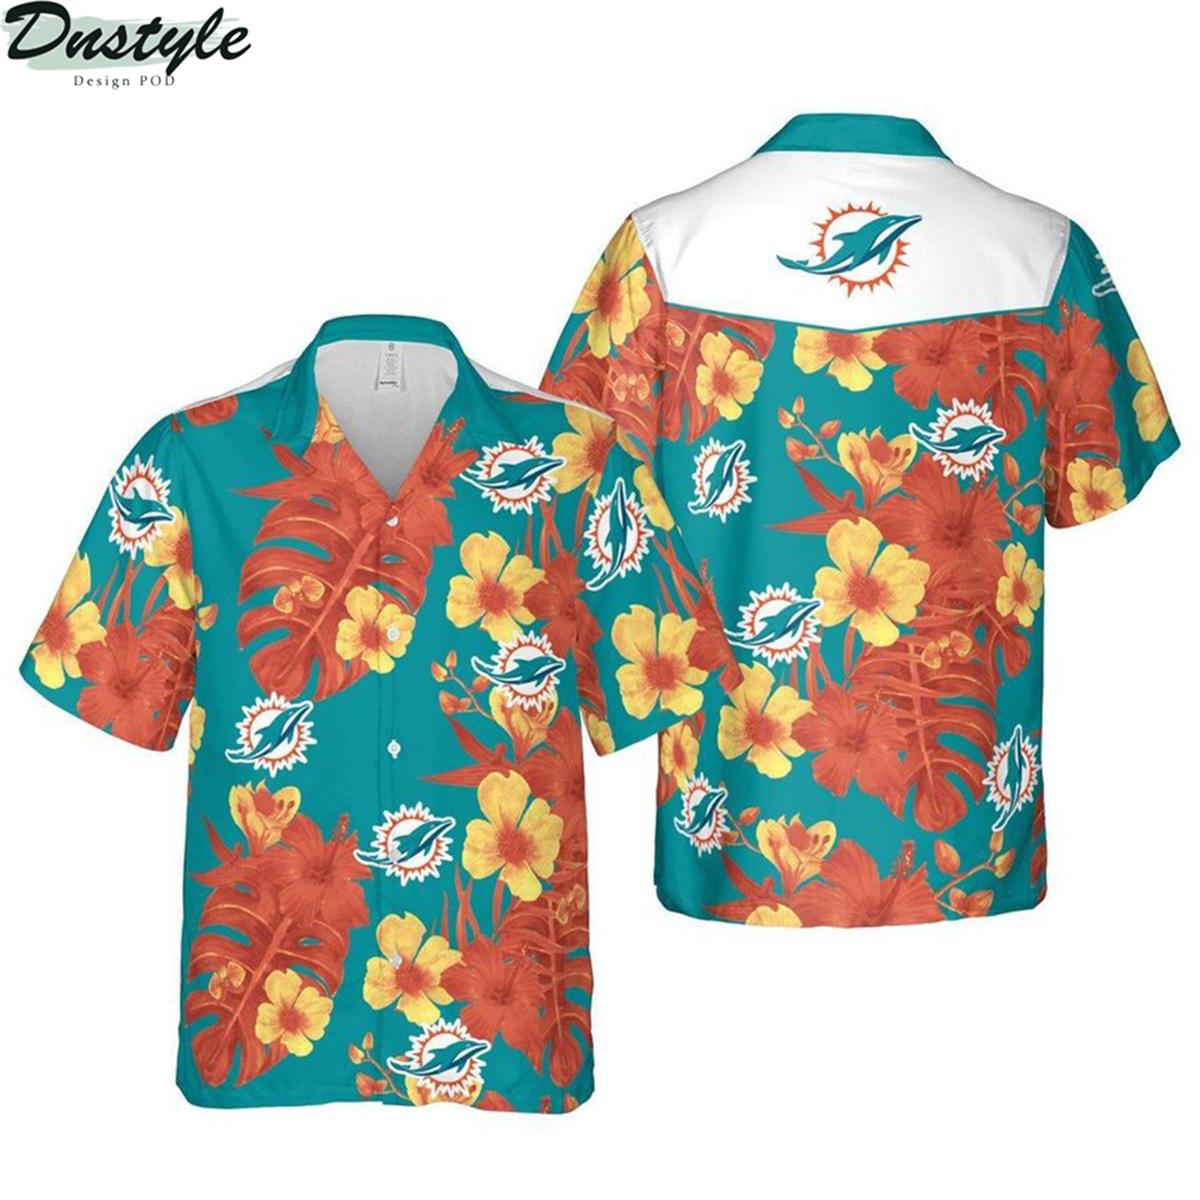 Miami dolphins nfl football hawaiian shirt 2